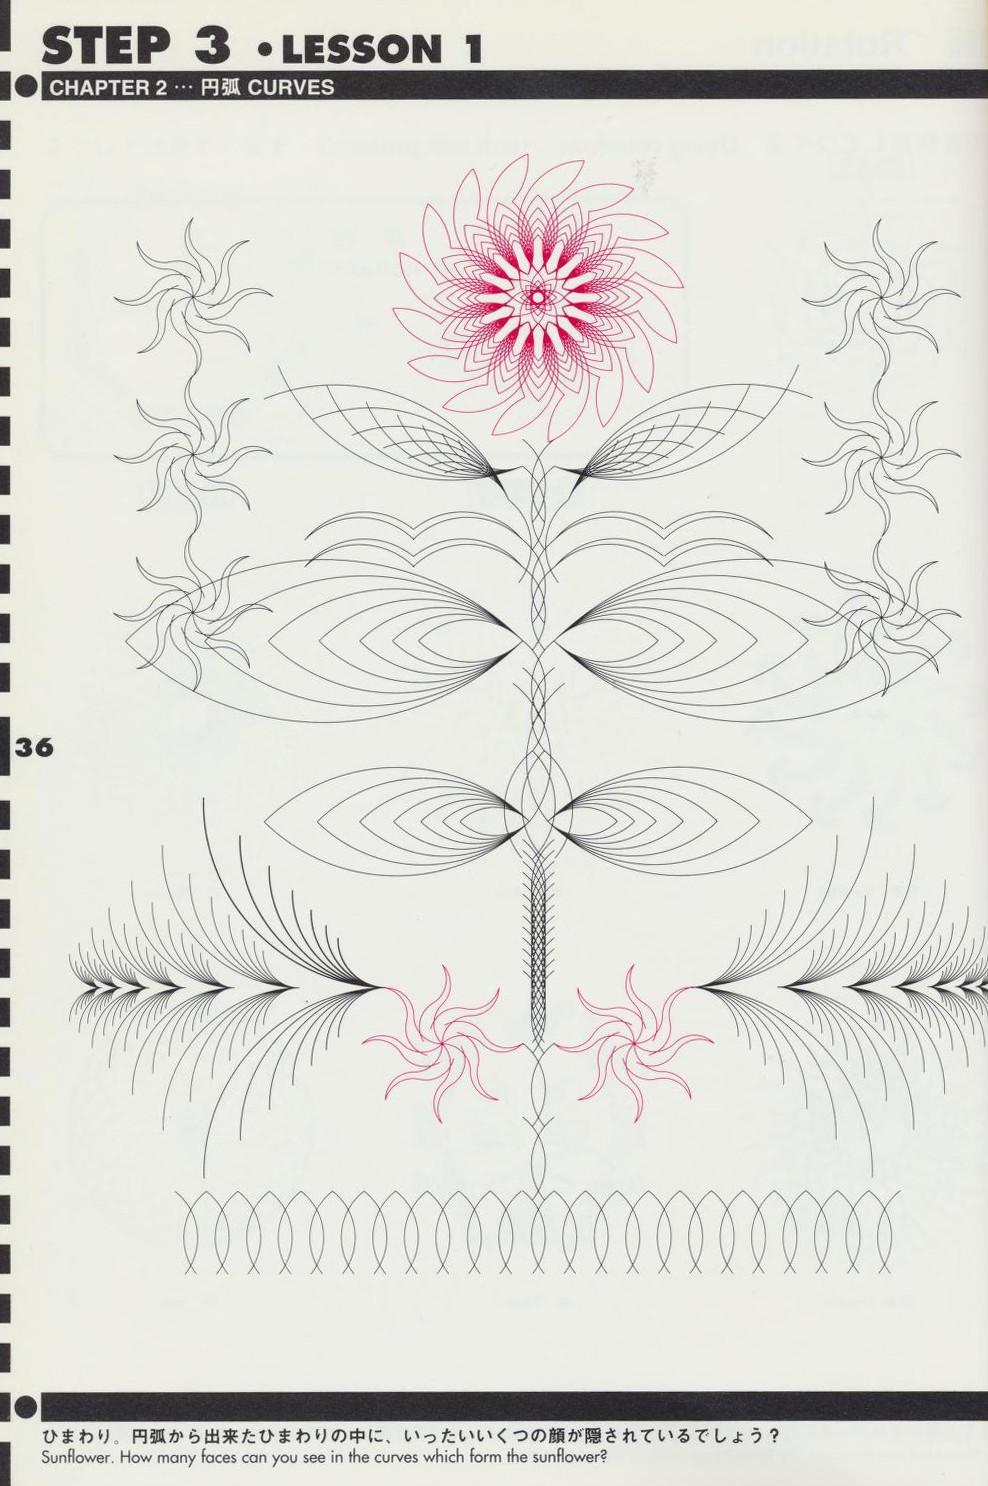 Osamu Sato, Sunflower, 1993